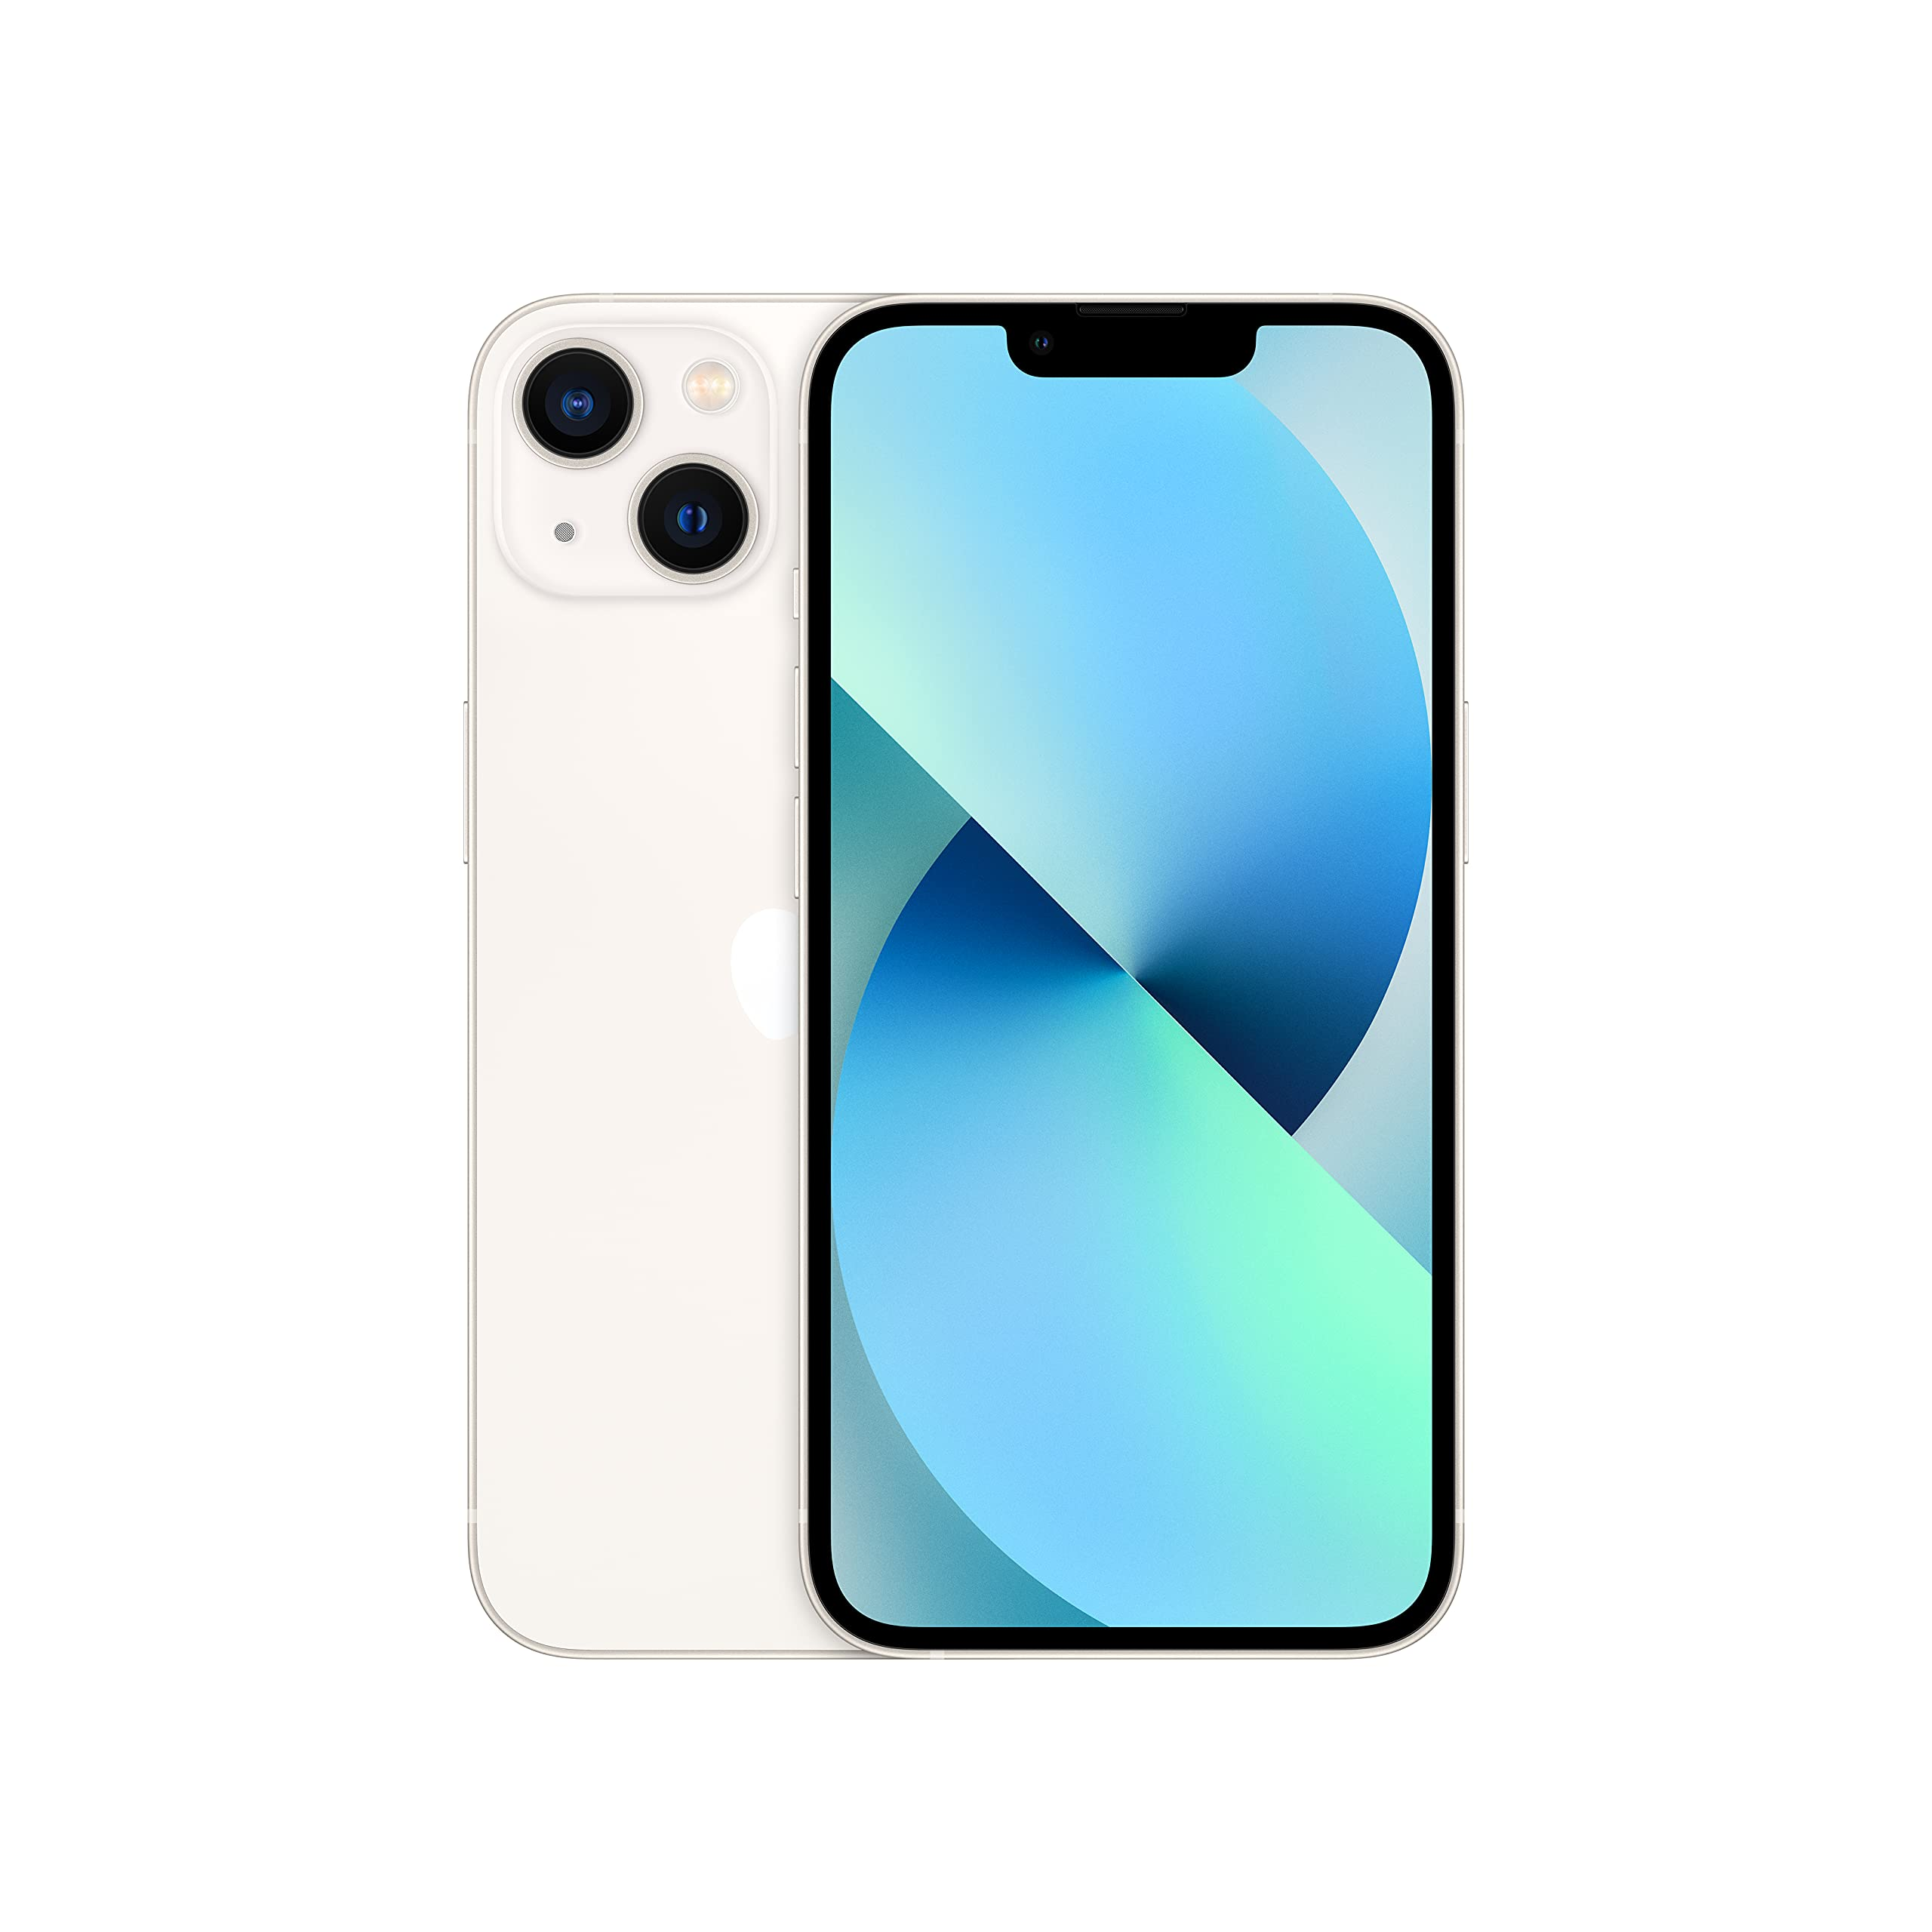 Apple iPhone 13 (256GB) - Starlight